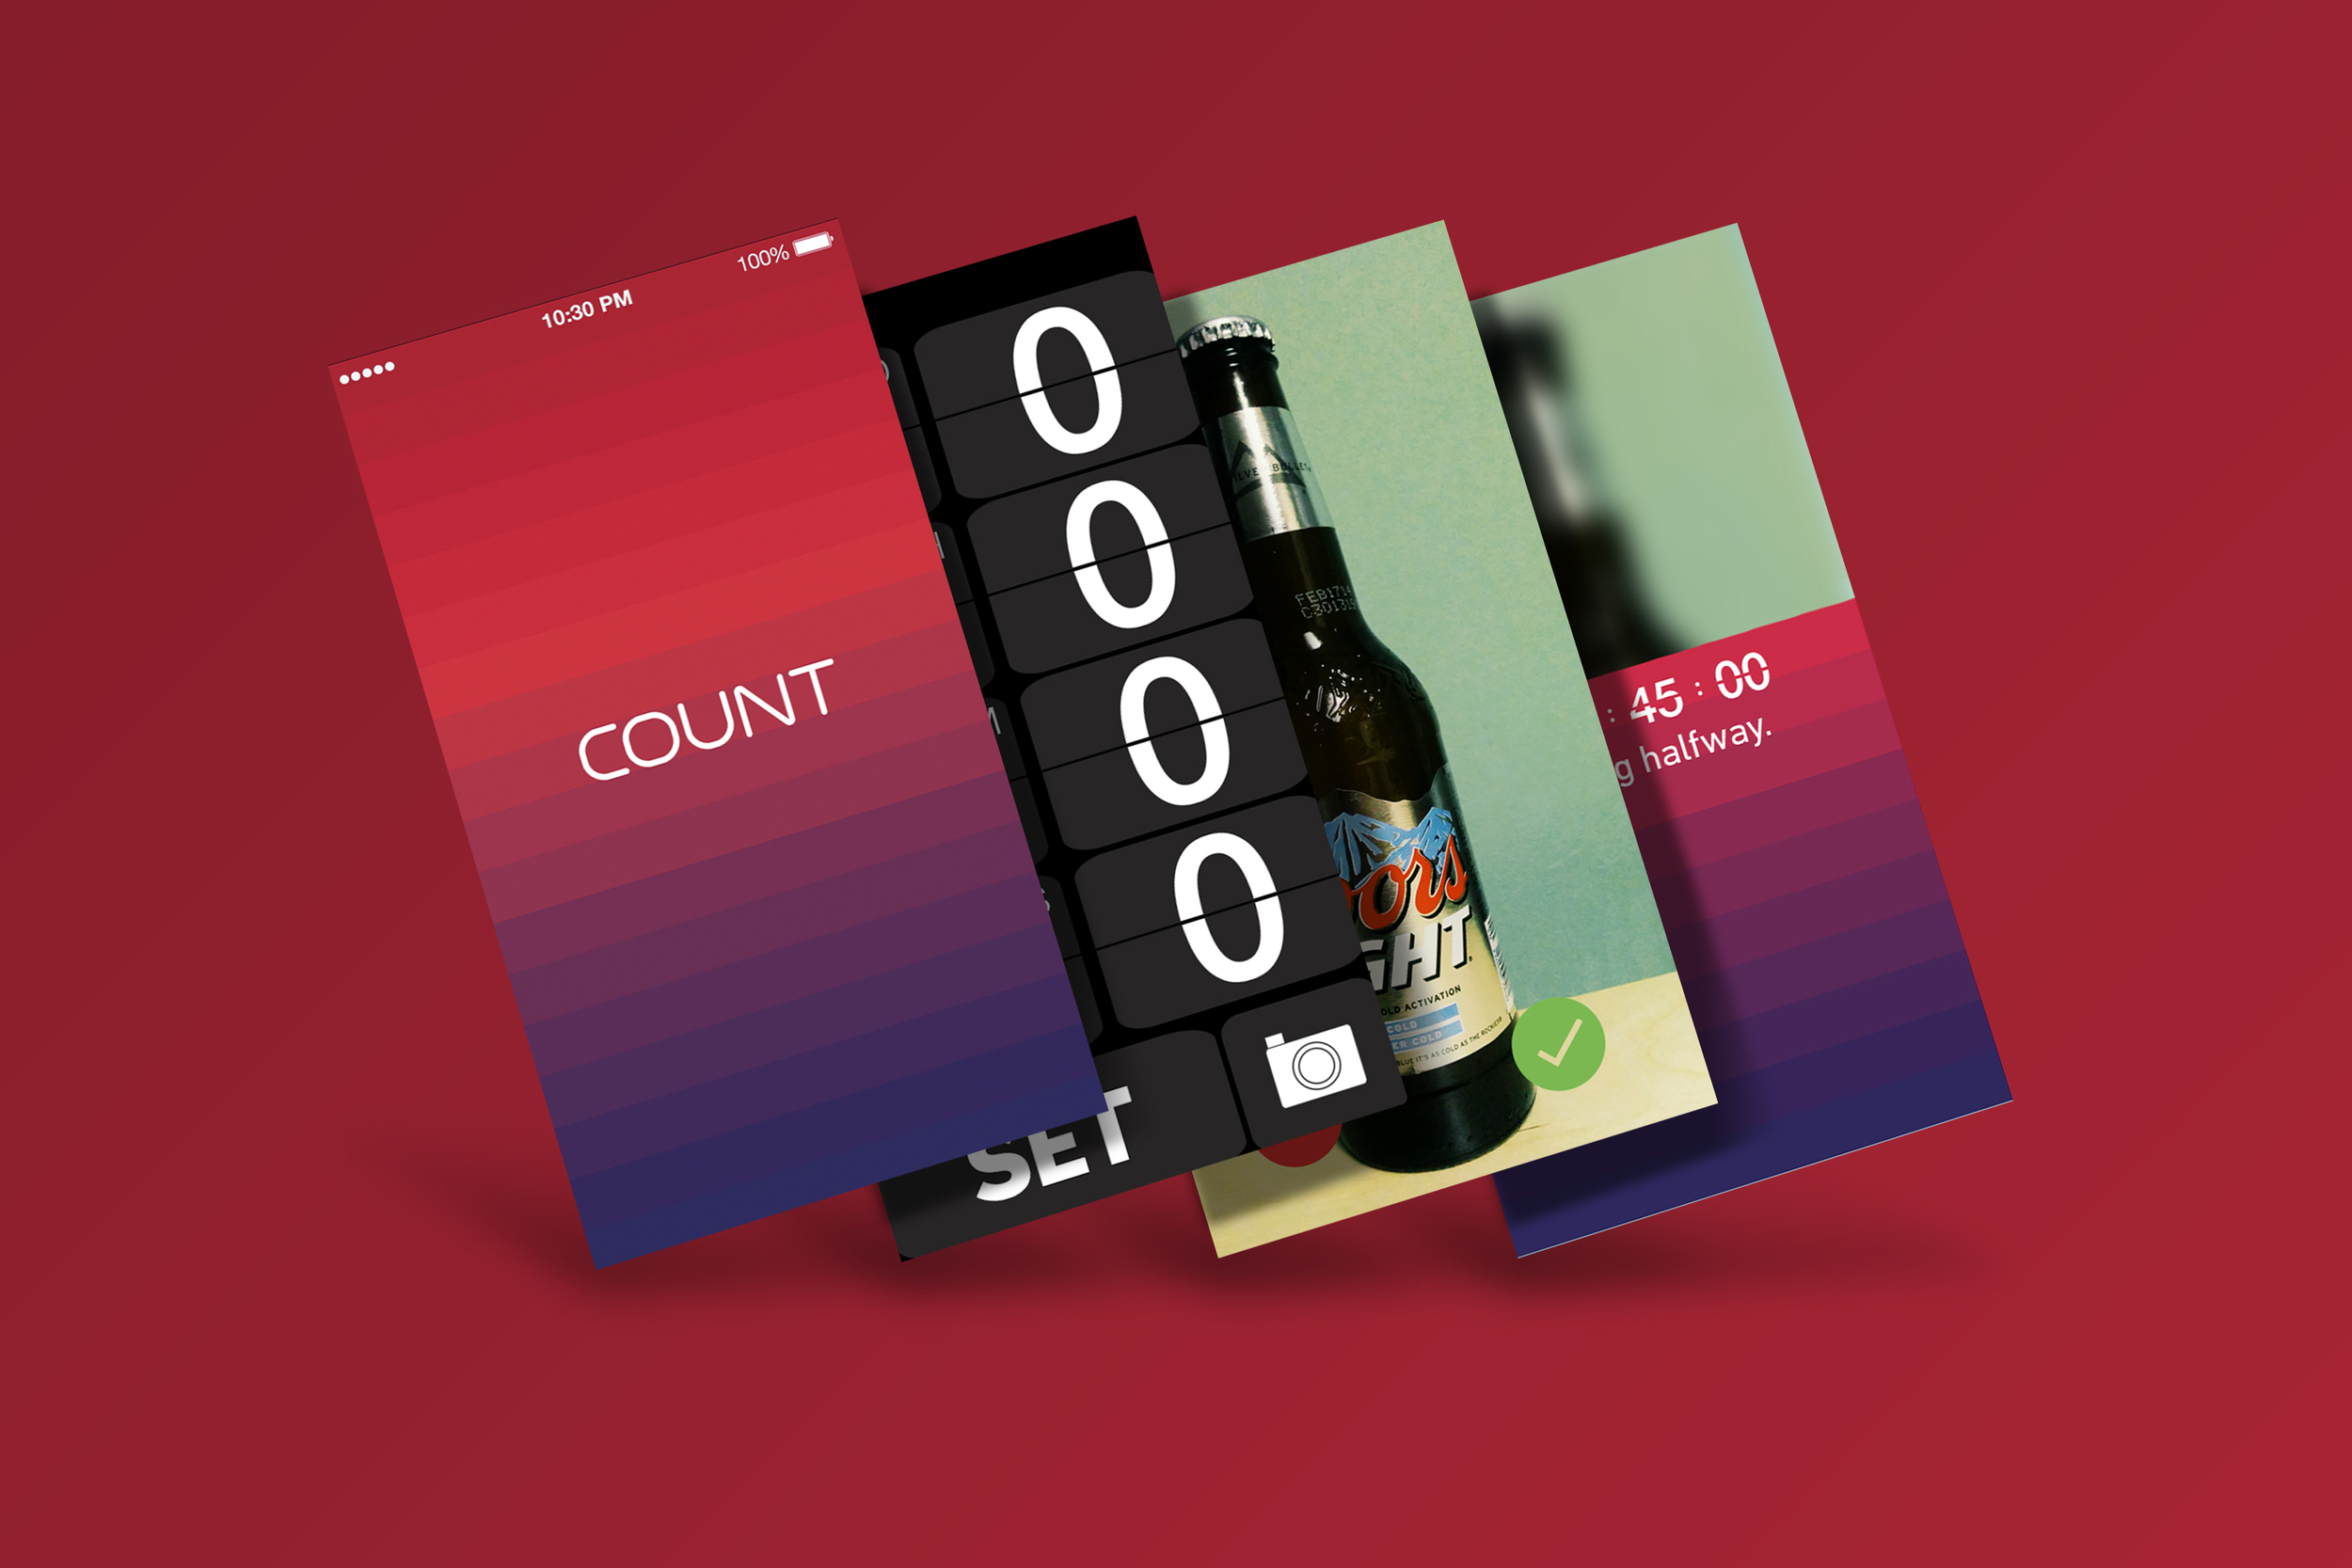 CountAppScreenPreview.jpg